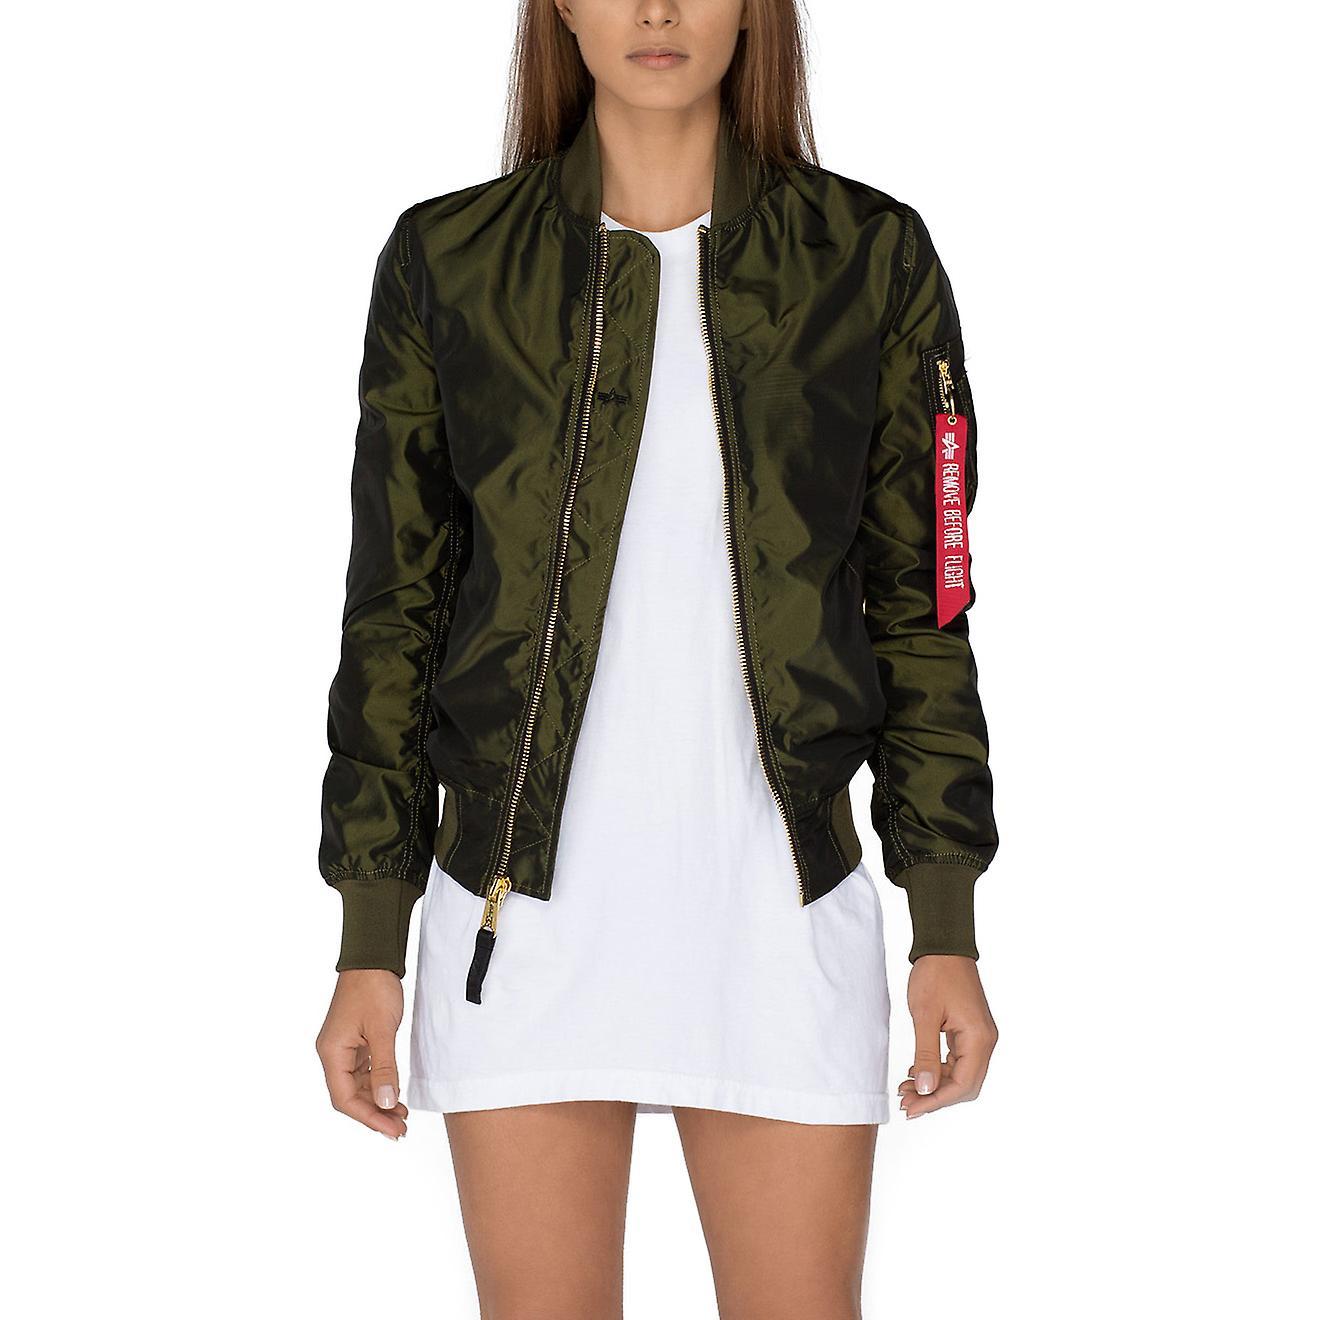 Alpha industries ladies jacket MA 1 LW PM Iridium Wmn